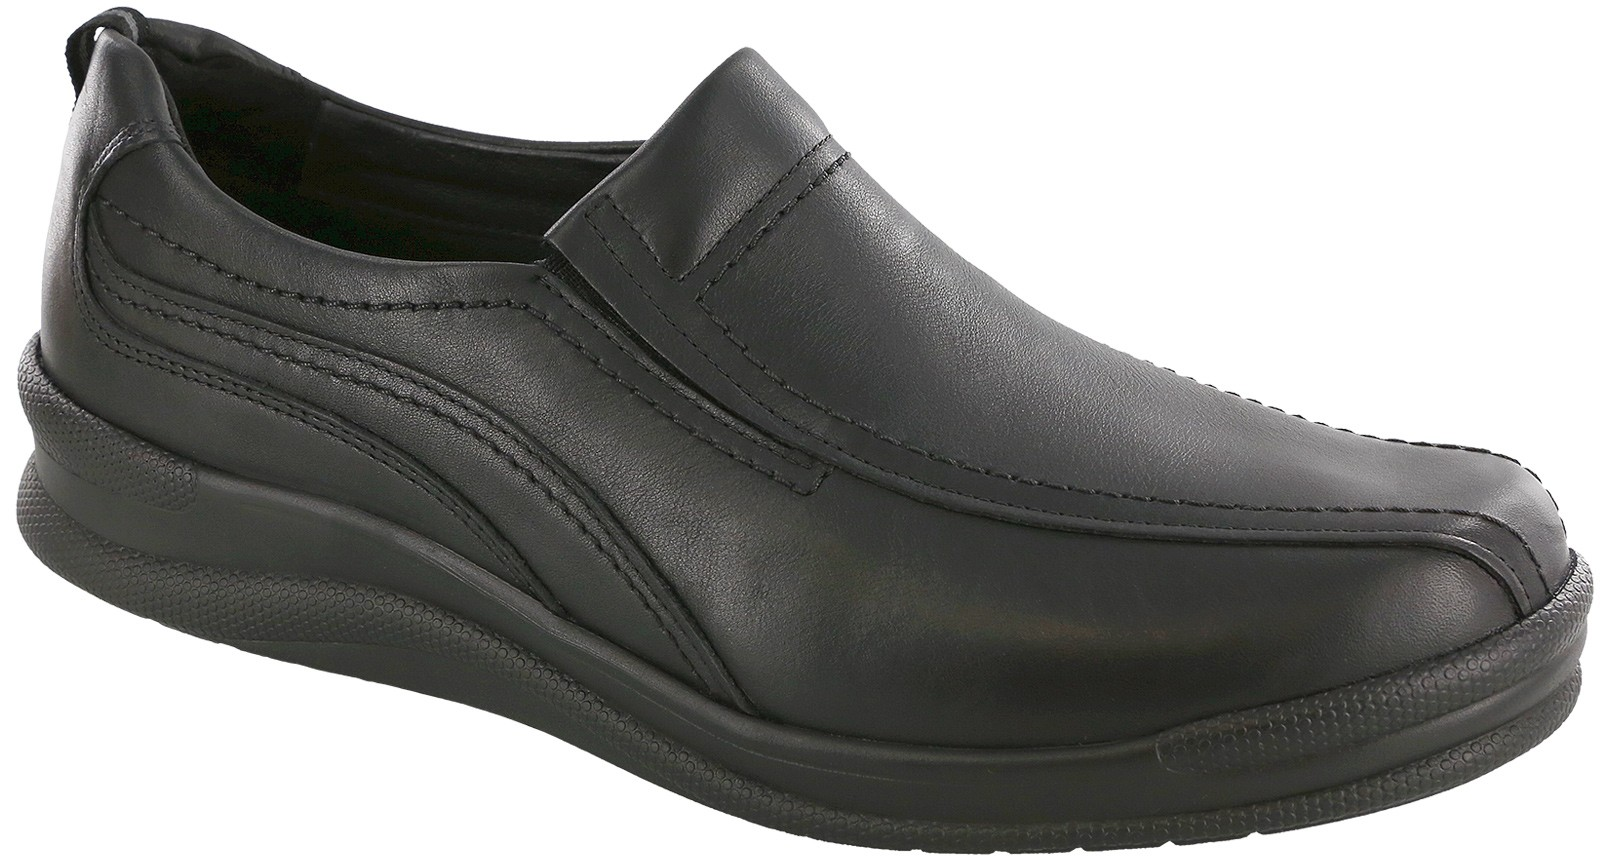 Ensor S Comfort Shoes